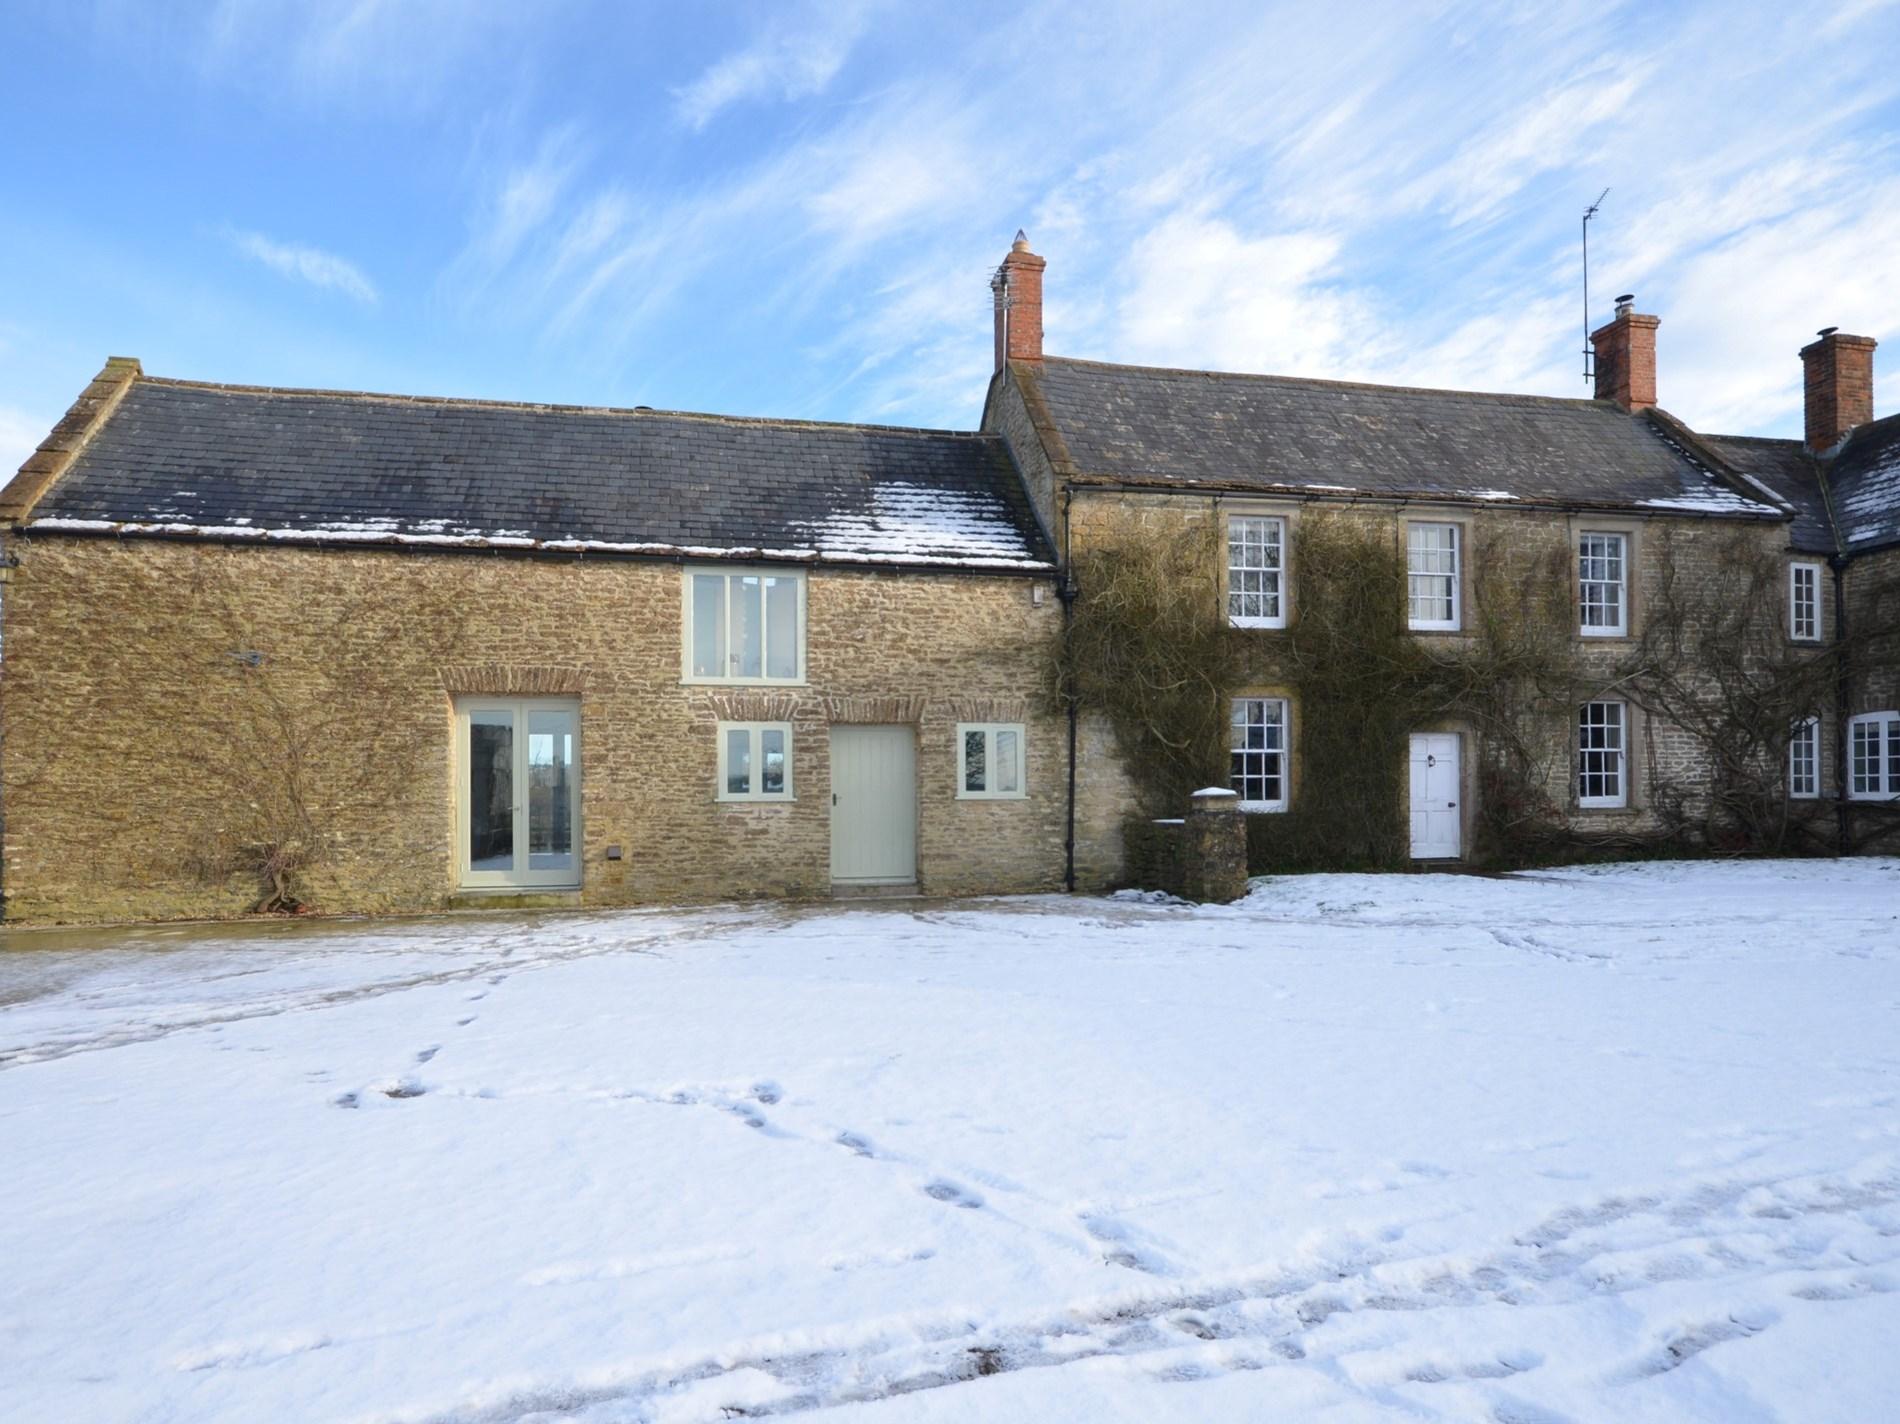 1 Bedroom Cottage in Bruton, Dorset and Somerset